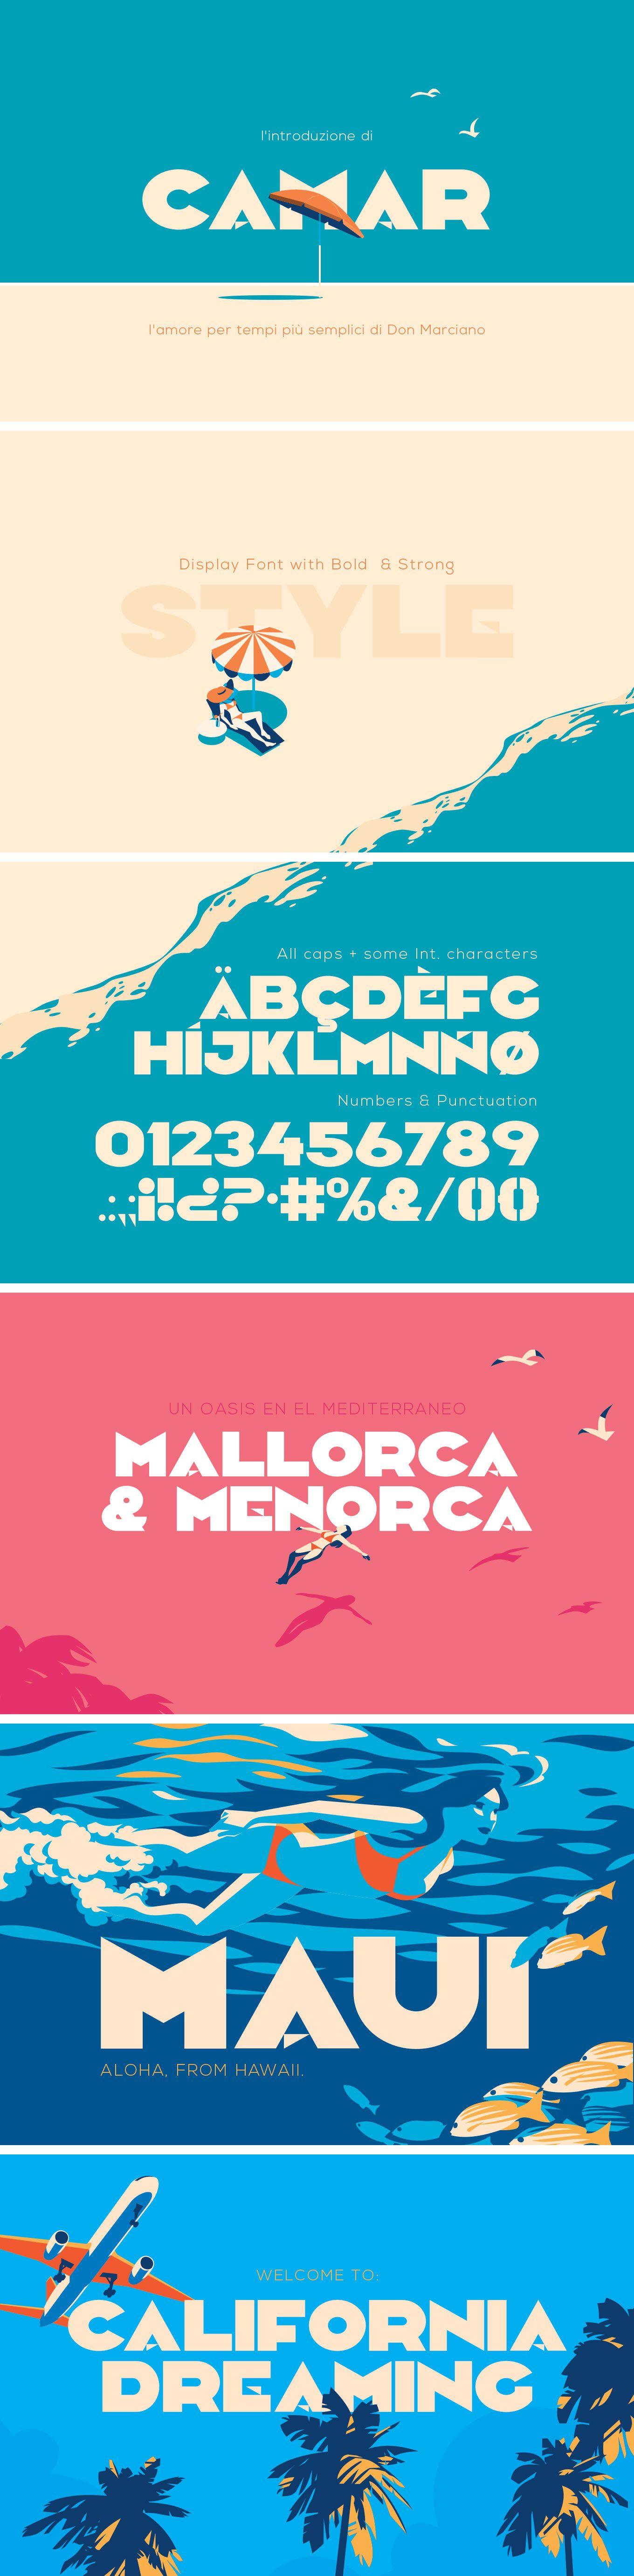 Camar Vintage Font Download Free Typeface Avec Images Police D Ecriture Typographie Ressources